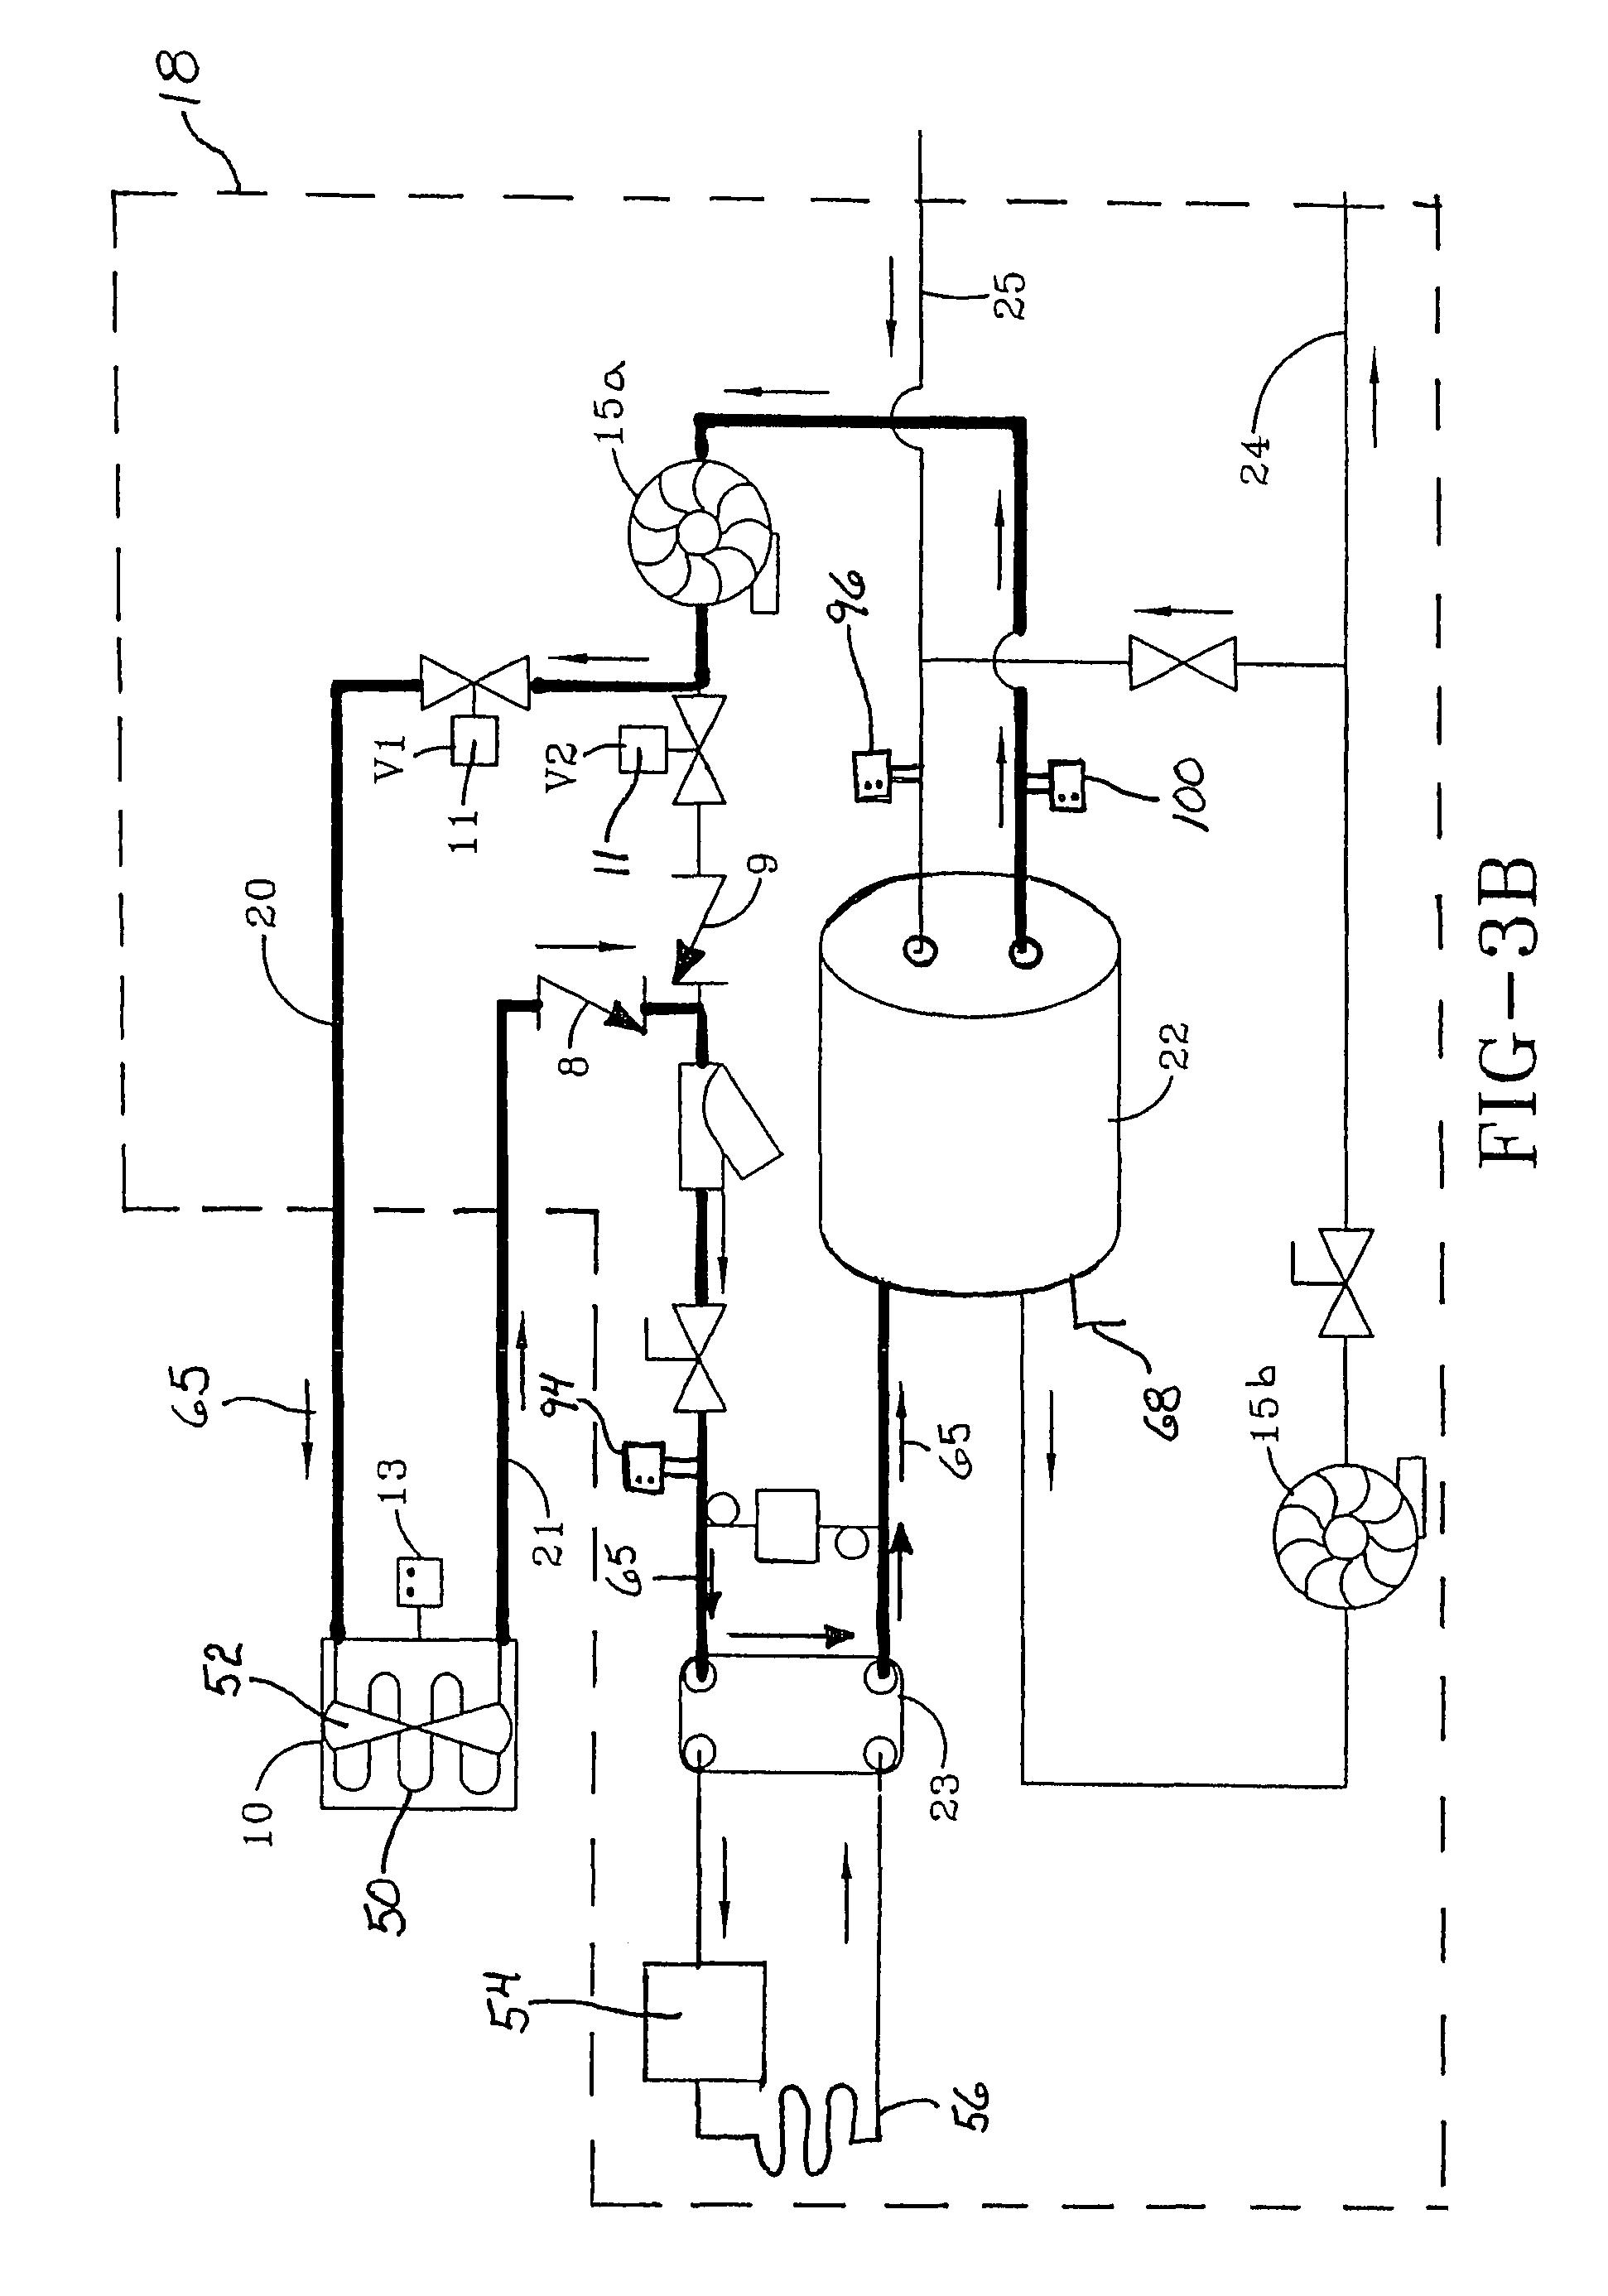 ducane gas furnace wiring diagram bosch electronic distributor of economizer imageresizertool com